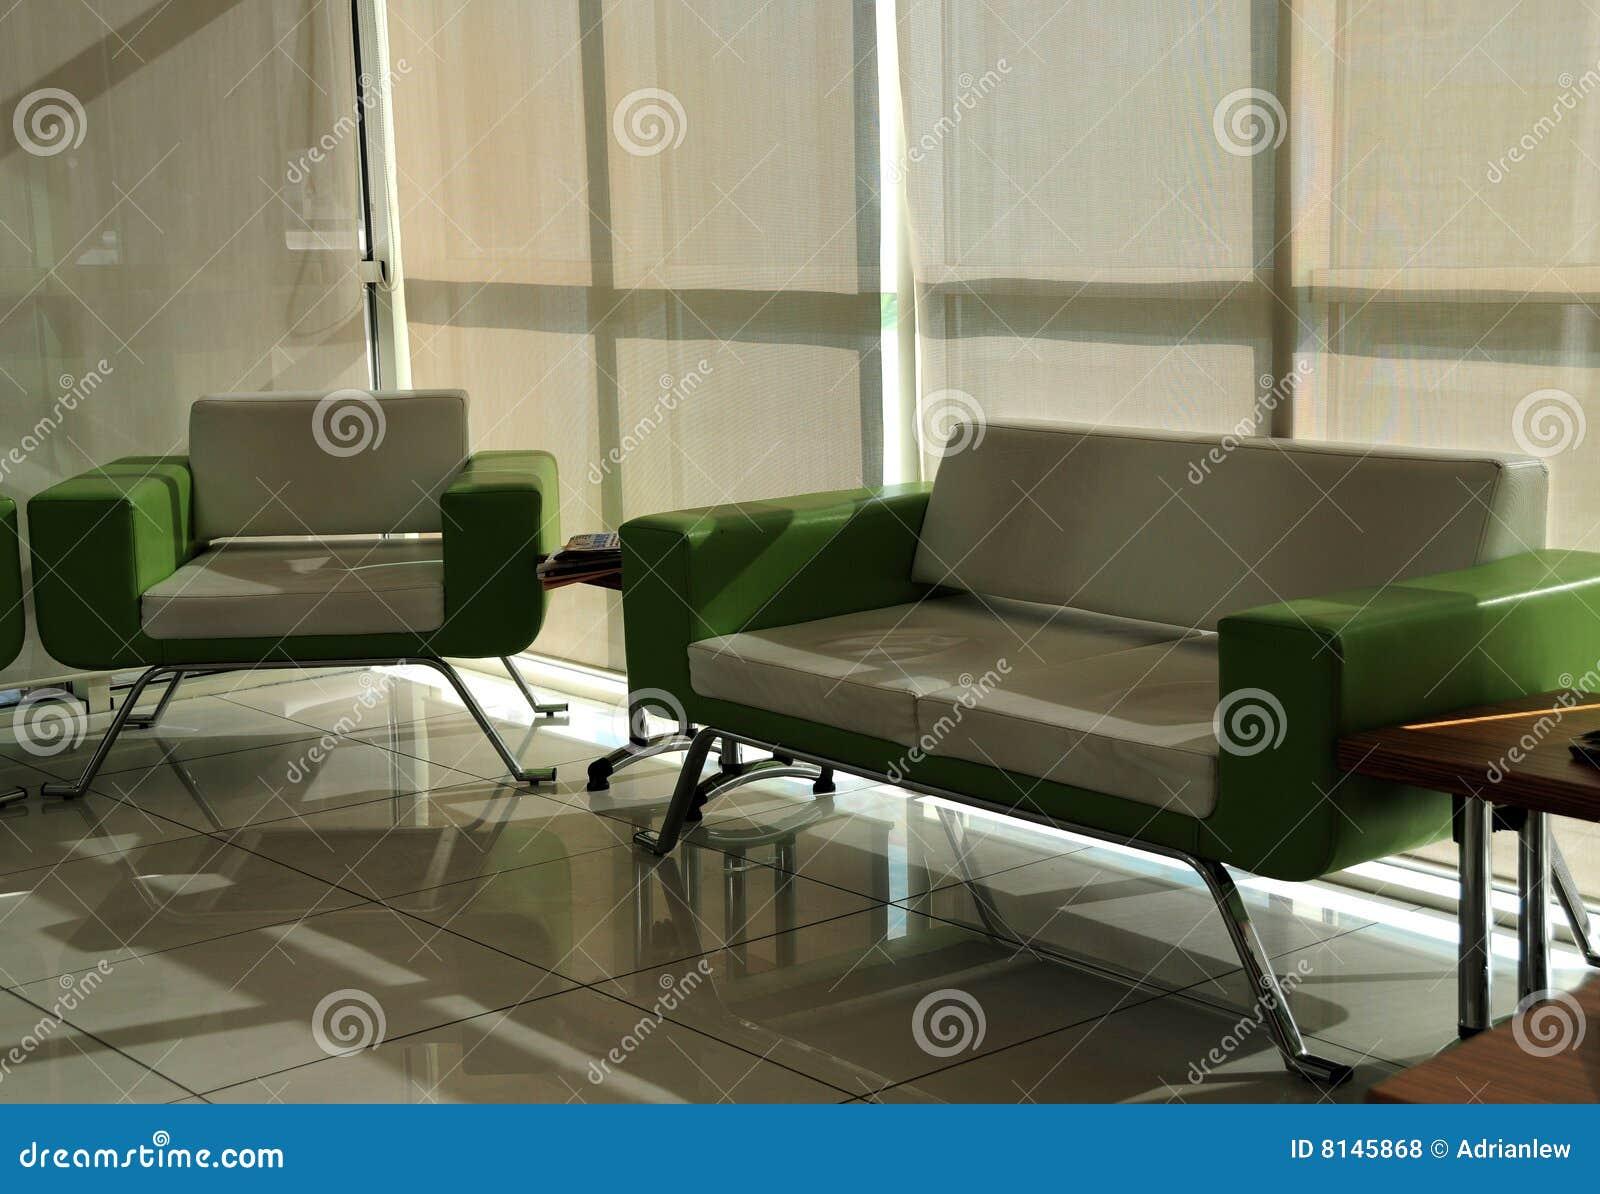 Muebles De La Sala De Espera Foto De Archivo Imagen 8145868 # Muebles De Sala